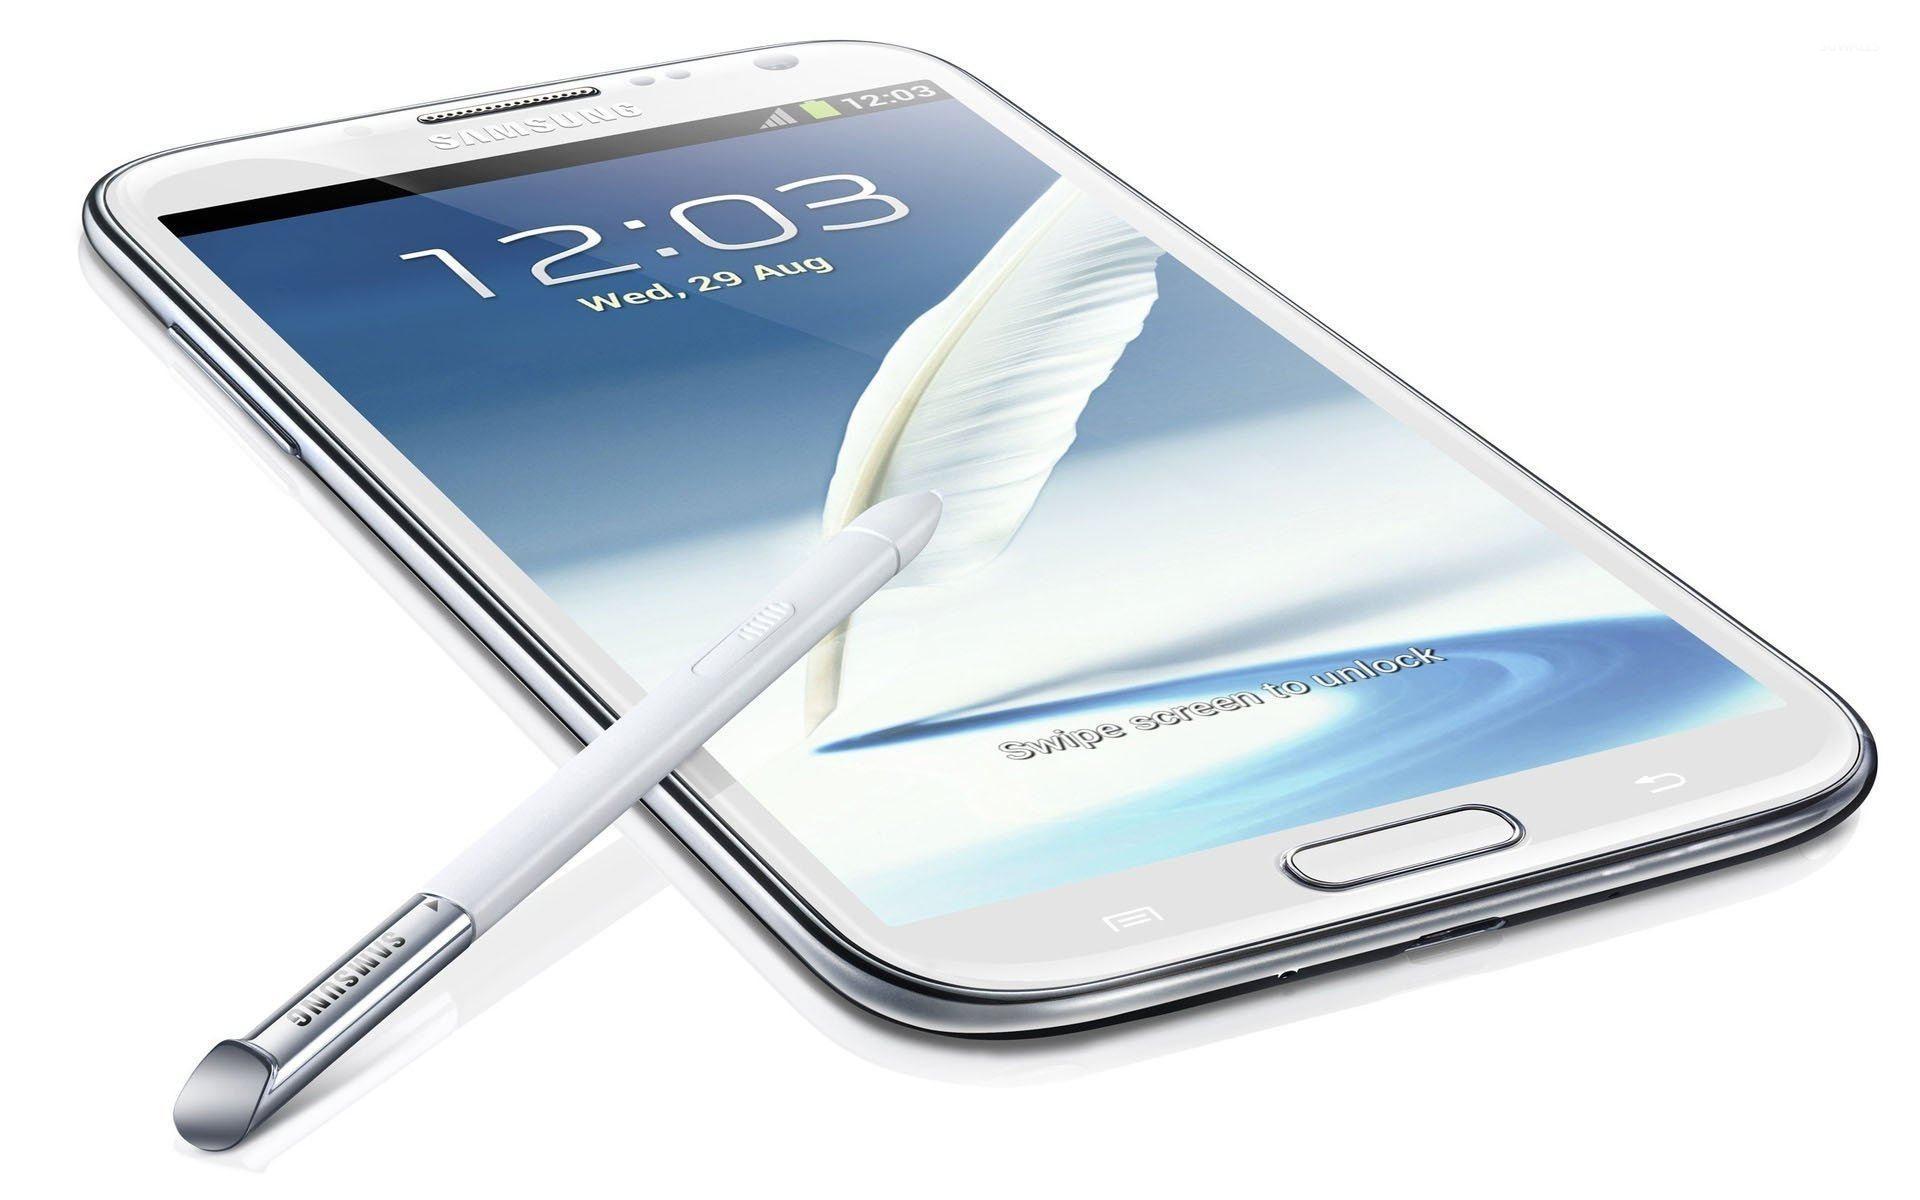 Samsung Galaxy Note II Wallpaper